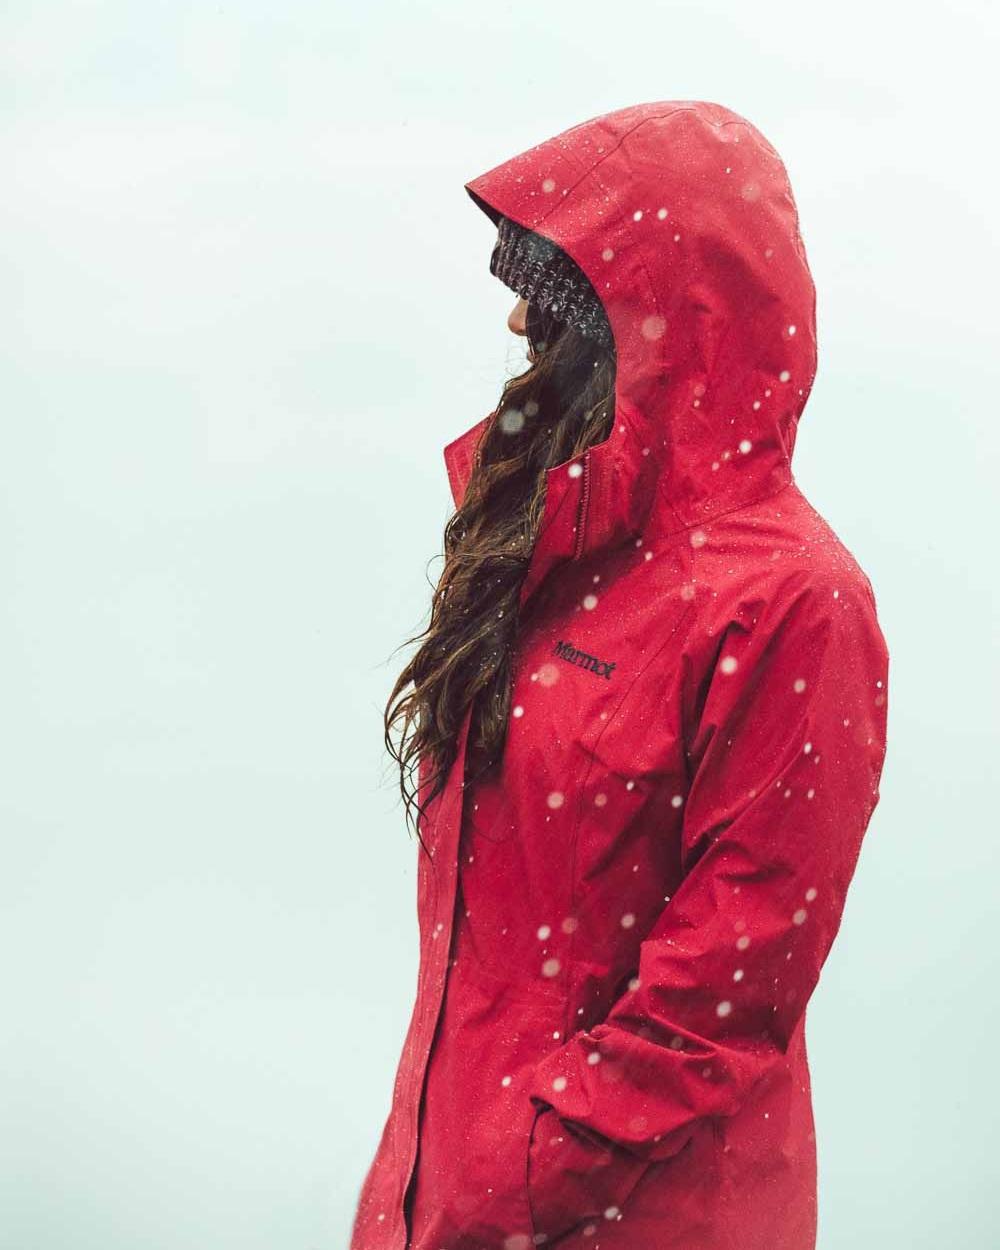 marmot-girl-jacket-red-hail-snow-rain-southwest-epic-strong-minimalist-jay-toups-jubbish.jpg